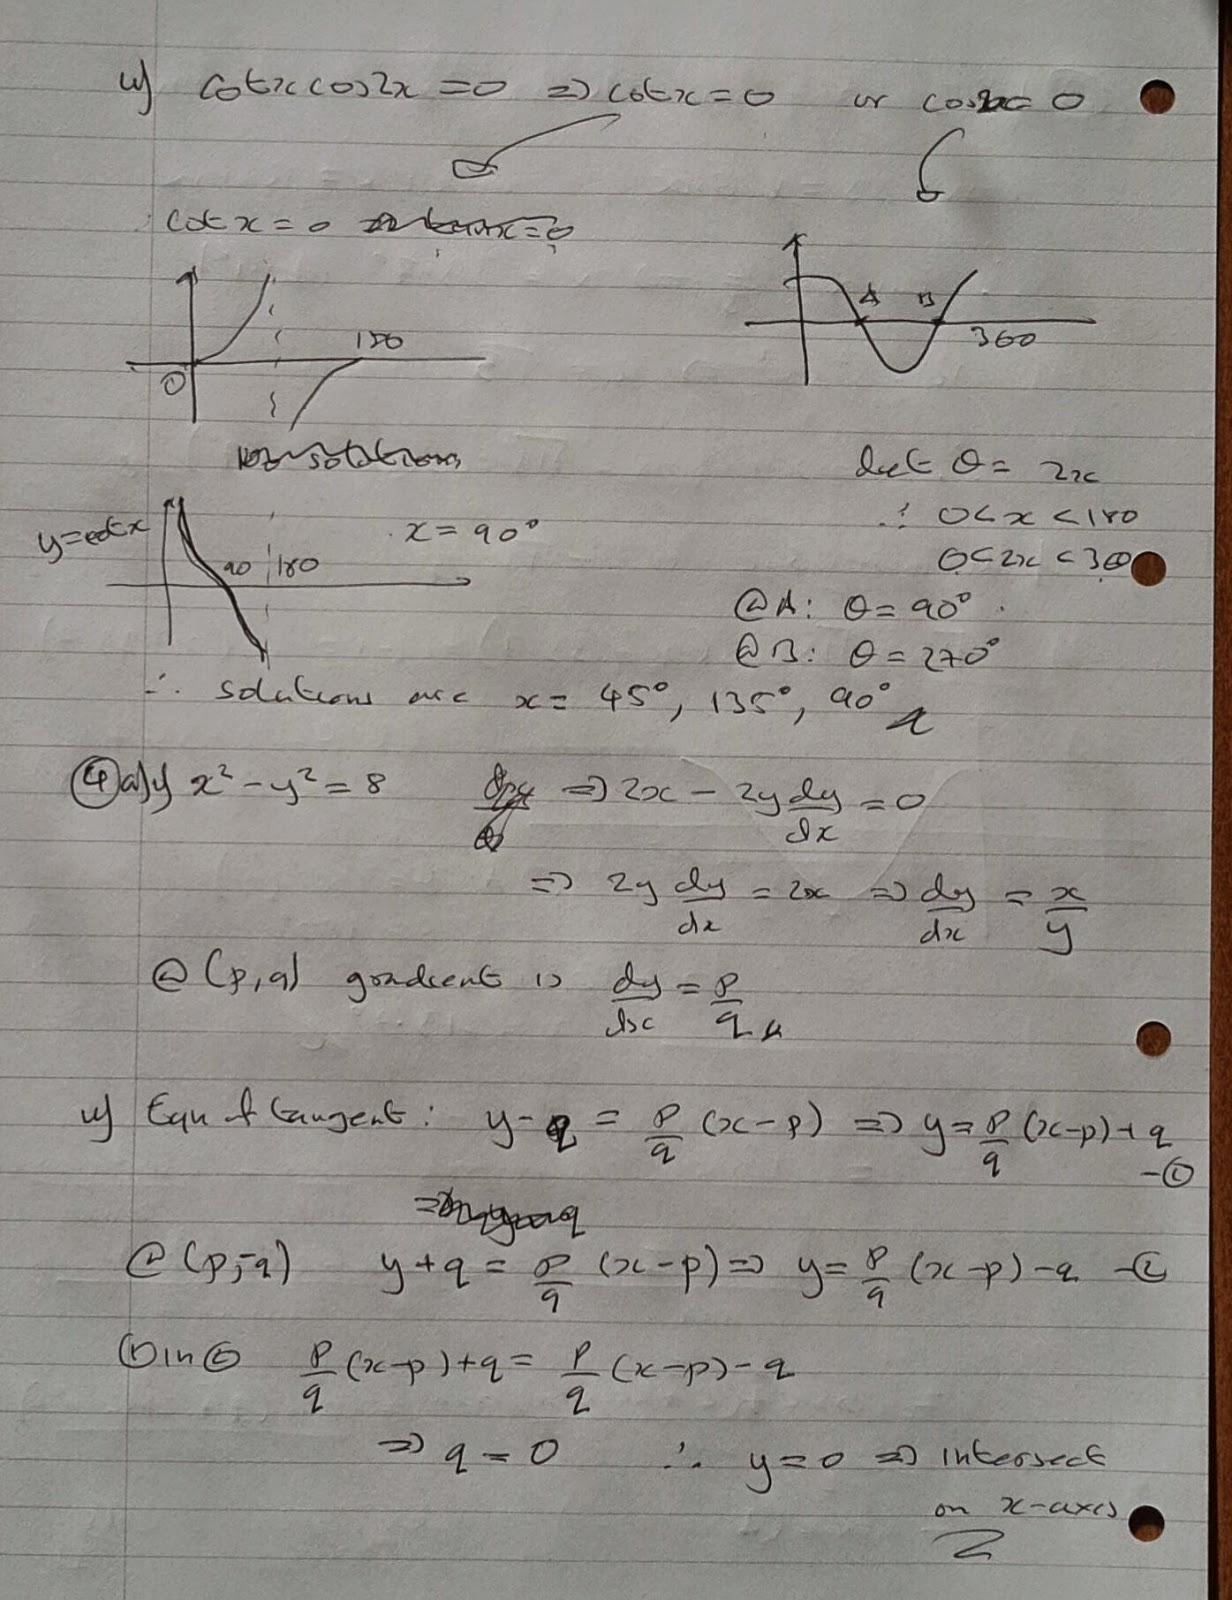 A Level Maths Notes: AQA Core 4 Winter 2013 Exam Paper